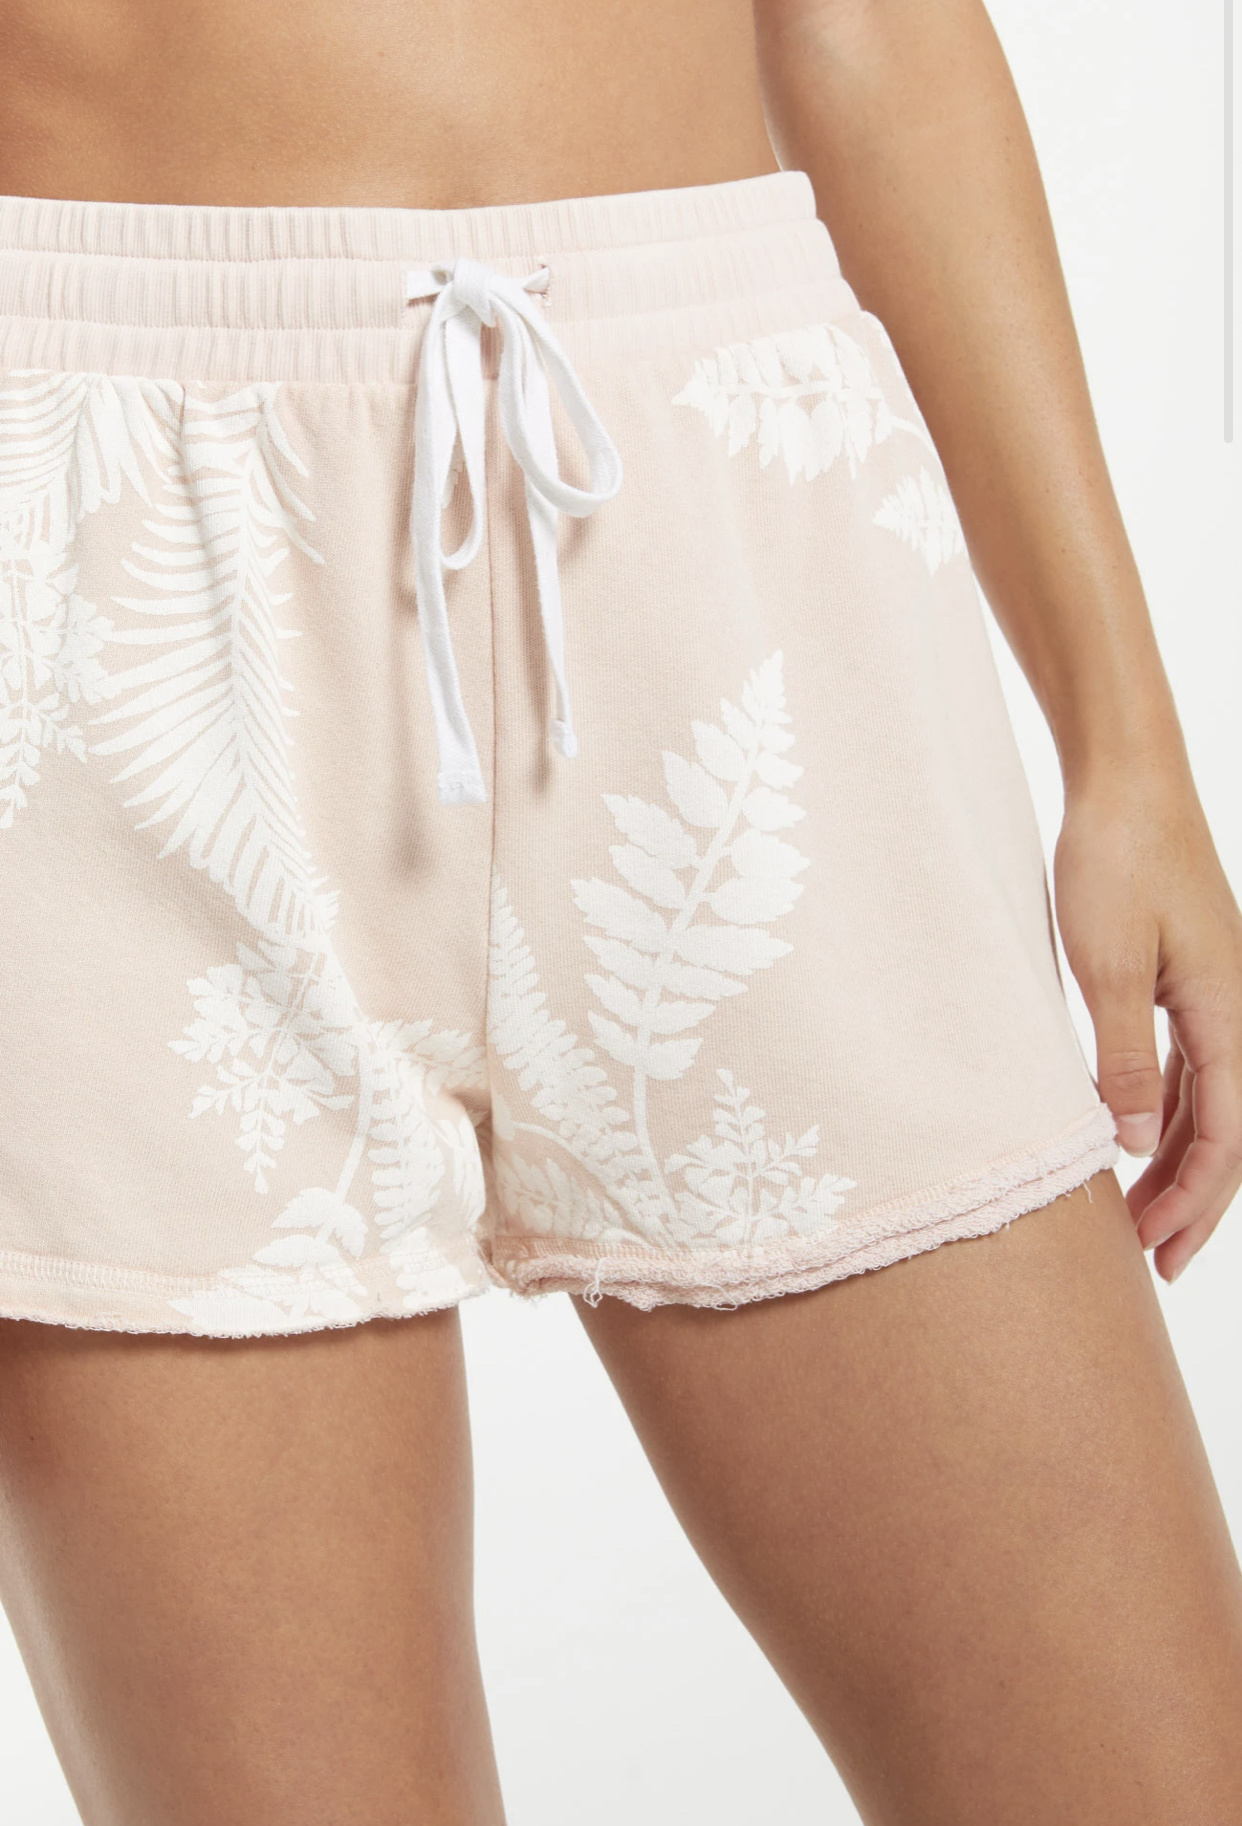 Ripley Palm Shorts